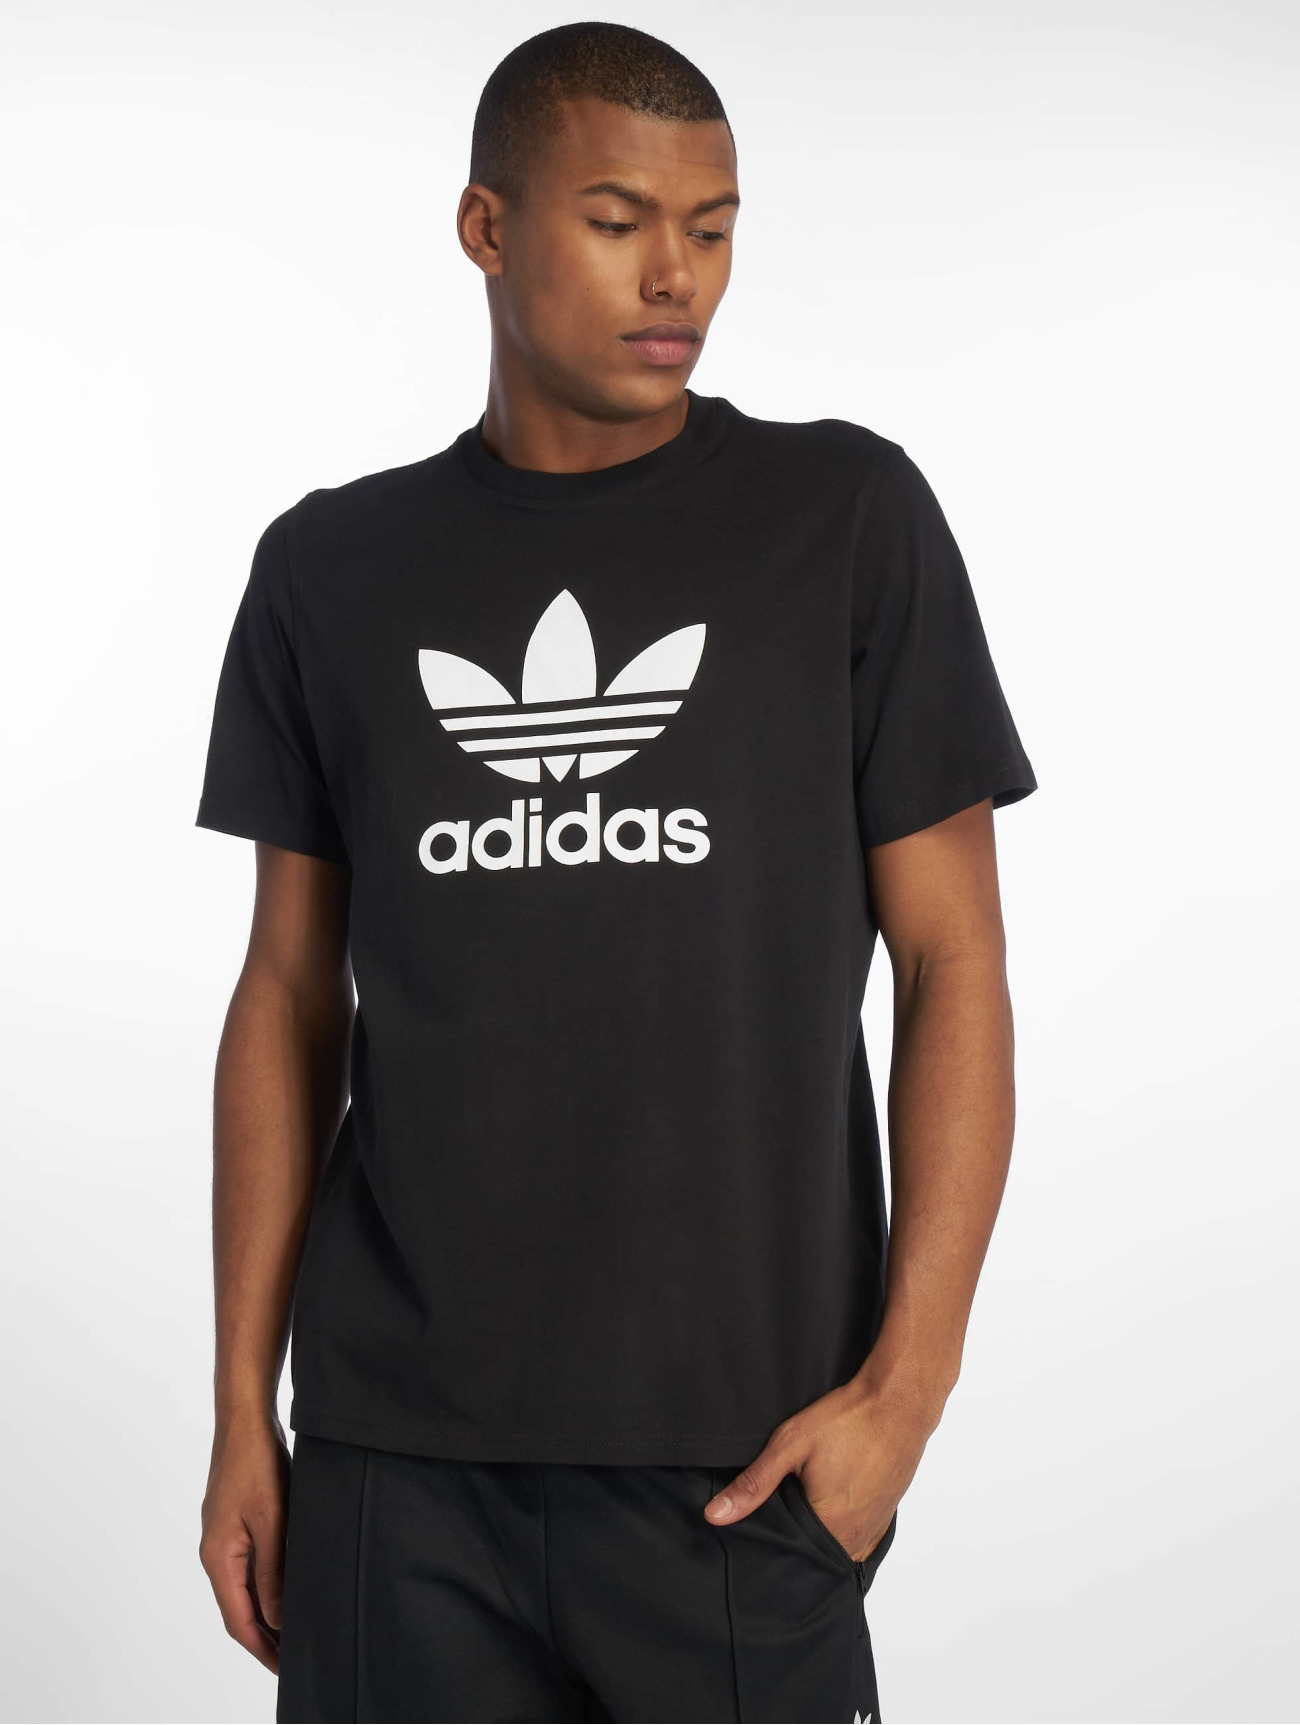 adidas original tee shirt homme